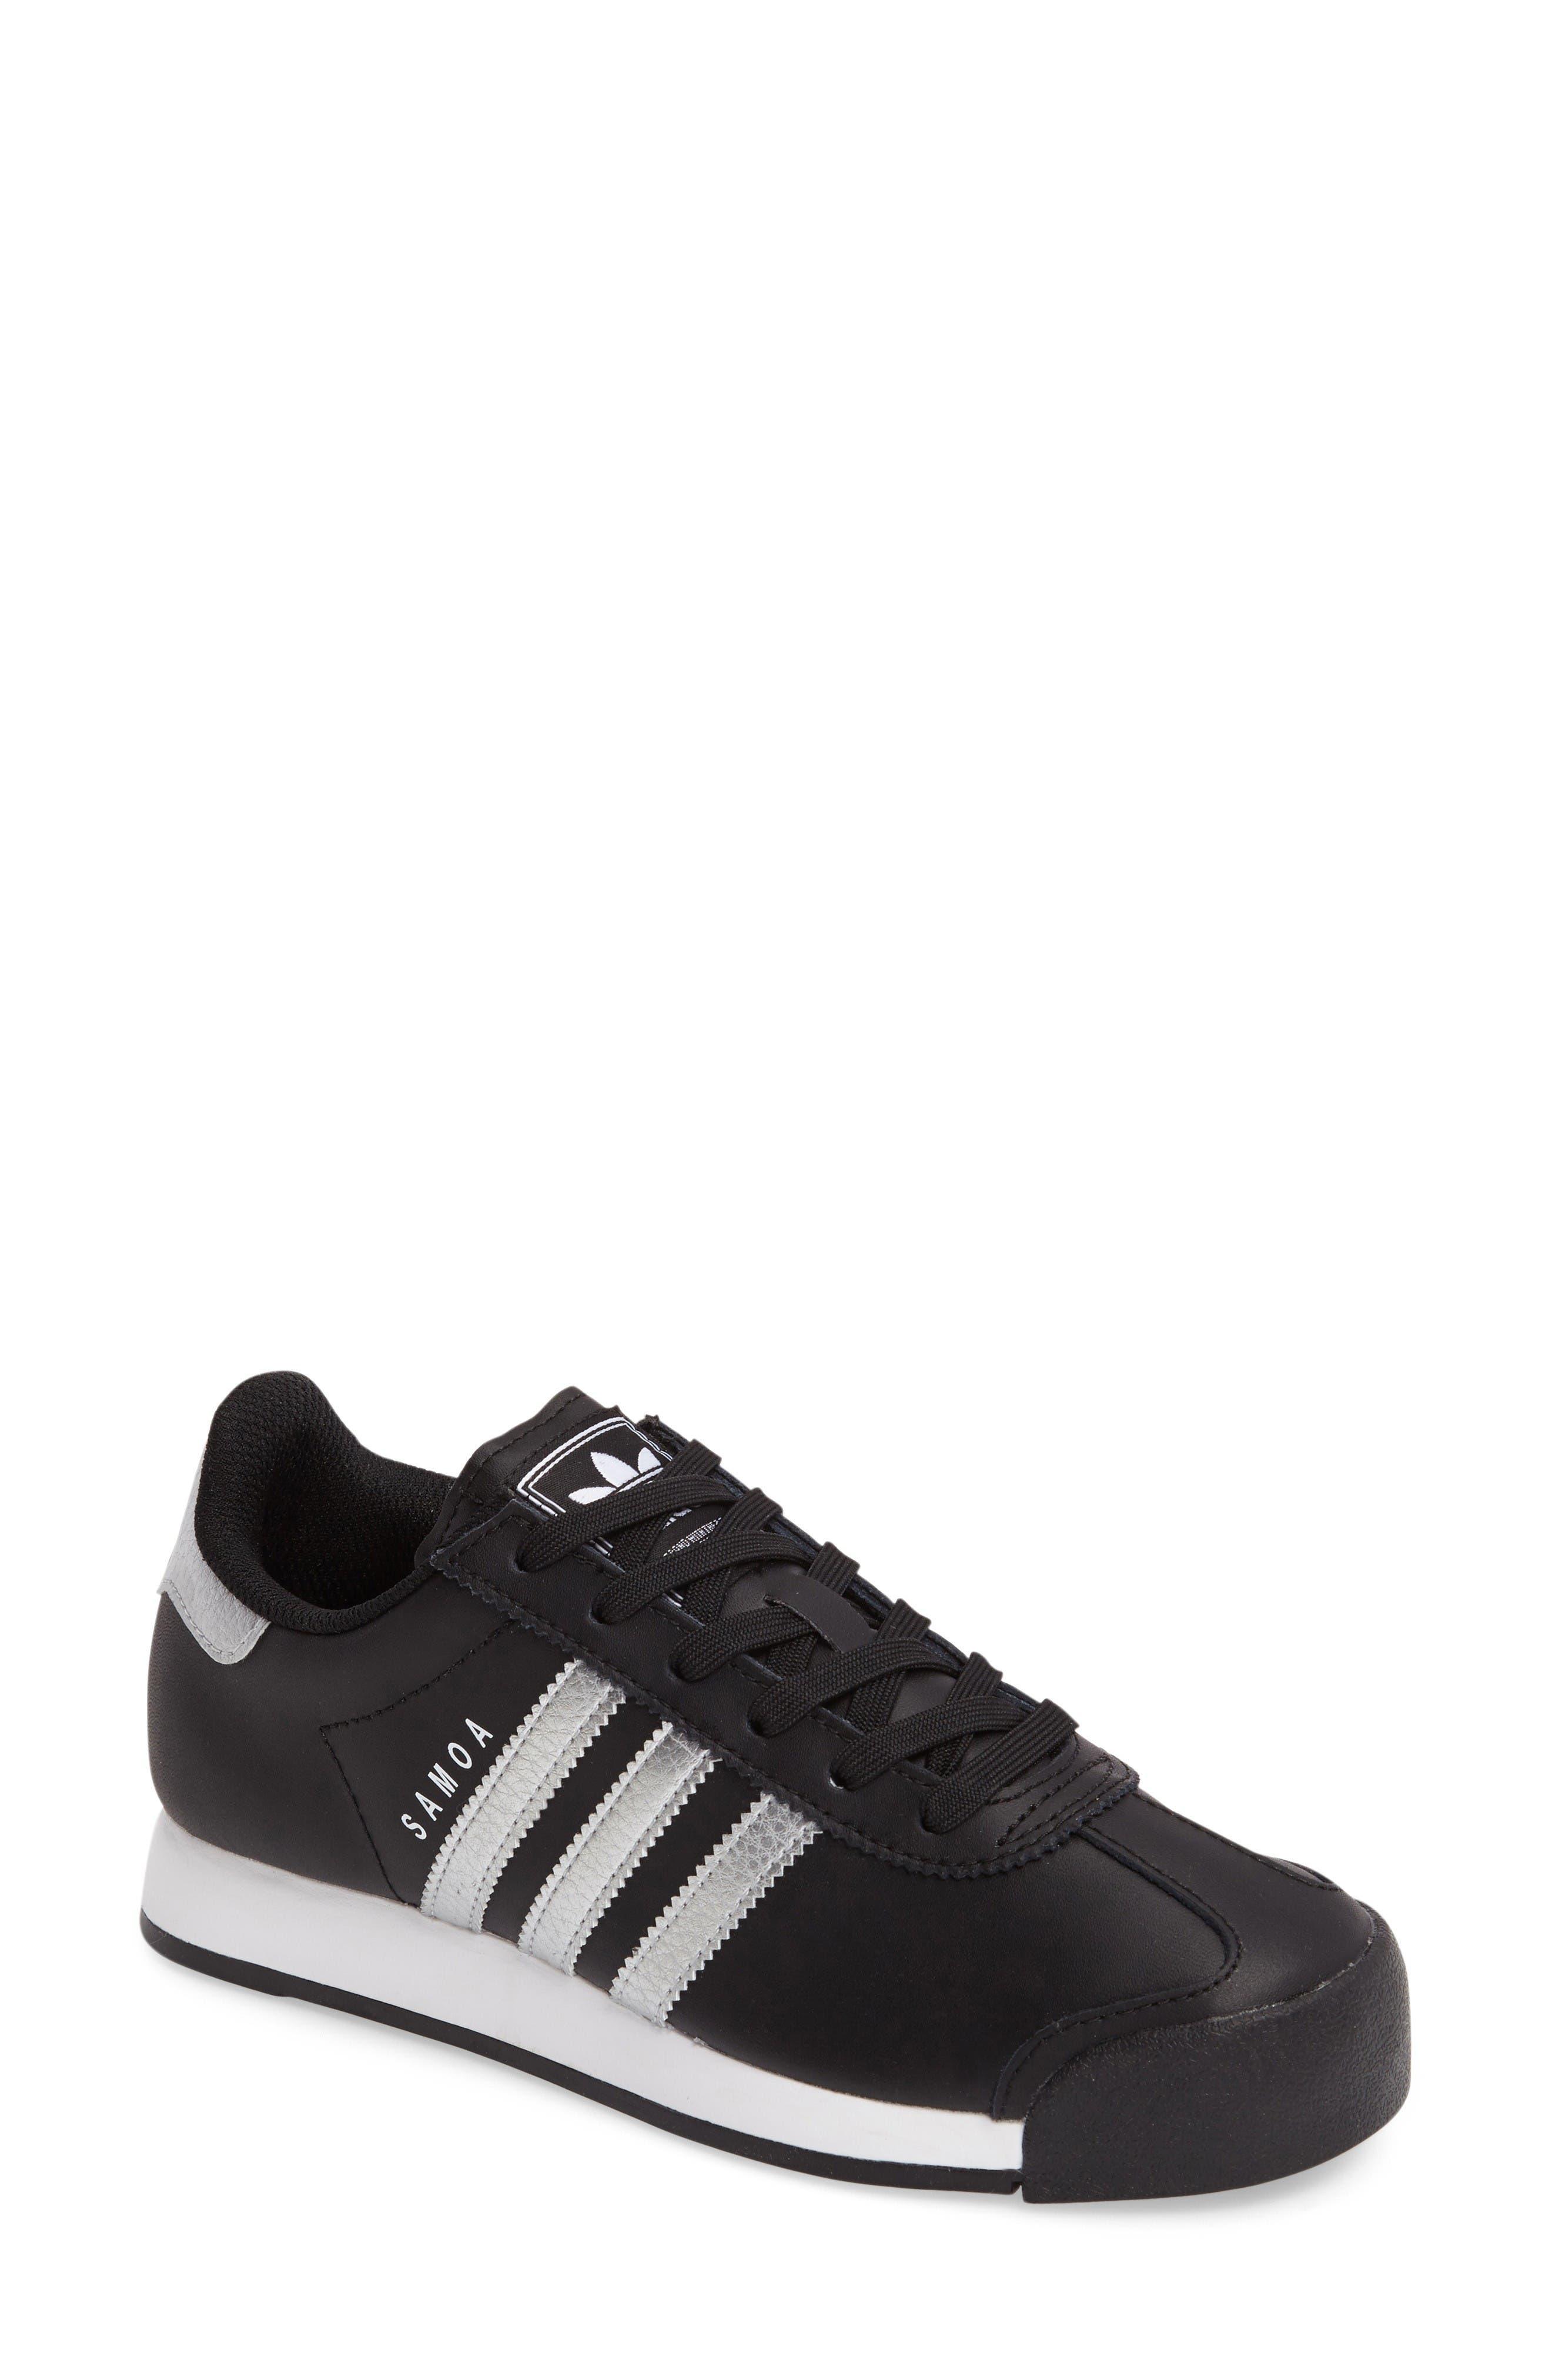 Alternate Image 1 Selected - adidas Samoa Sneaker (Women)